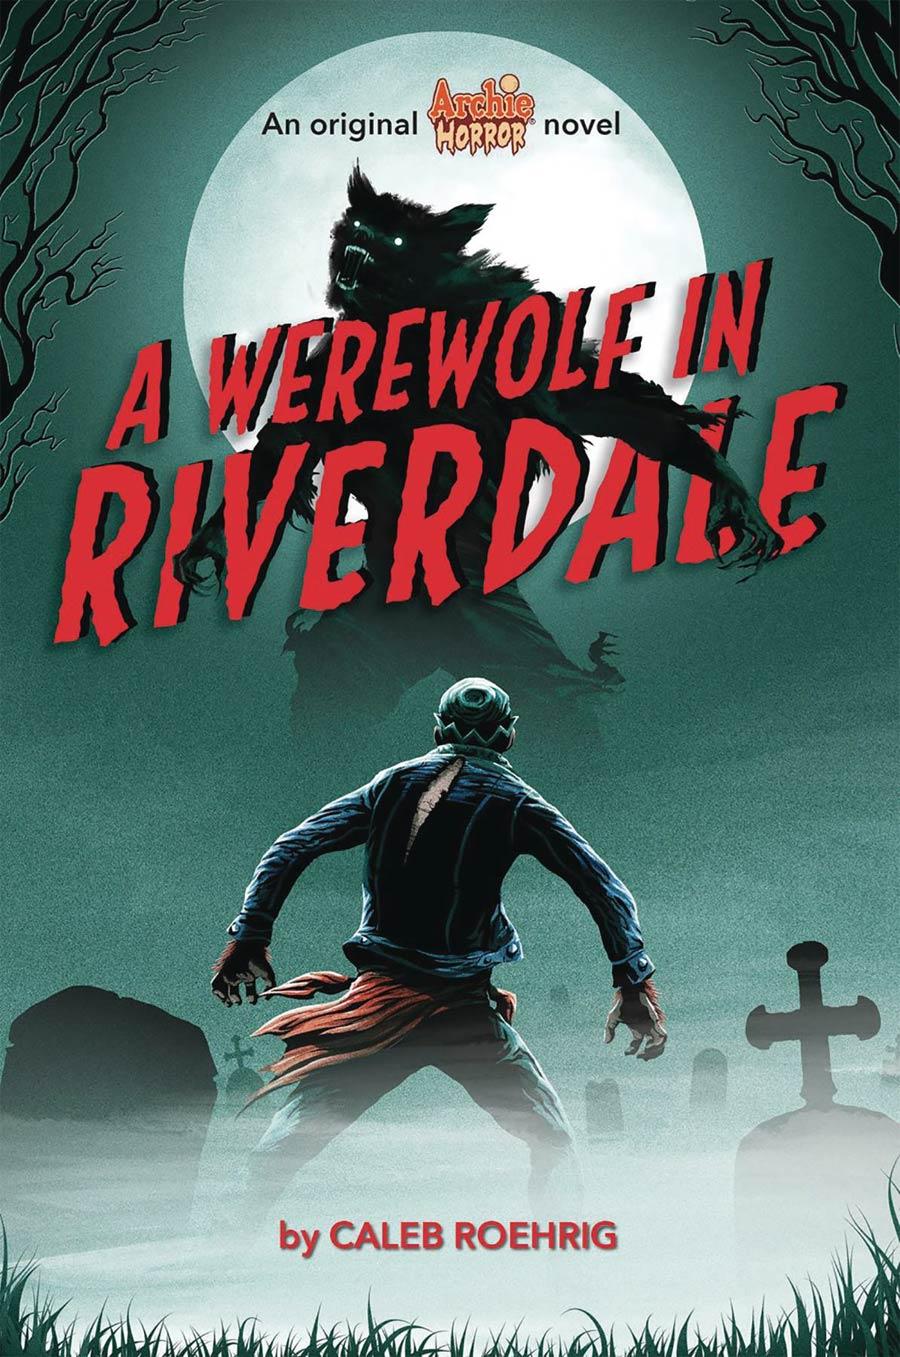 Archie An Original Horror Novel Vol 1 A Werewolf In Riverdale TP